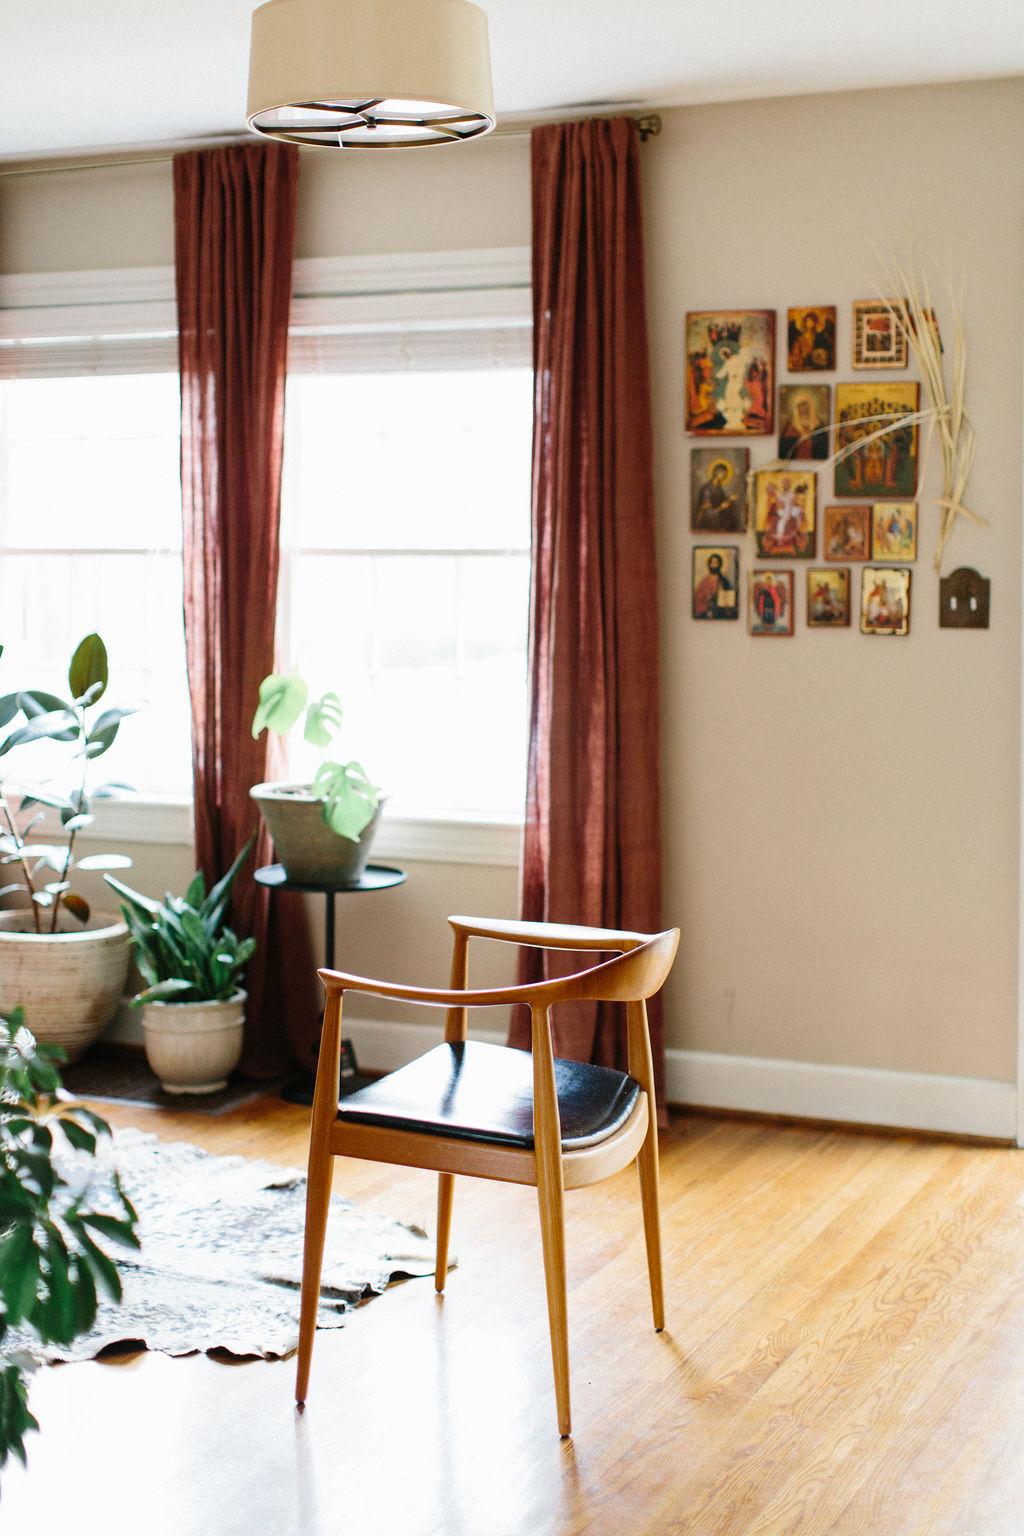 Journey-Jacobs-Design-Studio-Louisville-Residential-Commercial-Hospitality-Interior-Design-Traditional-Modern-19.JPG